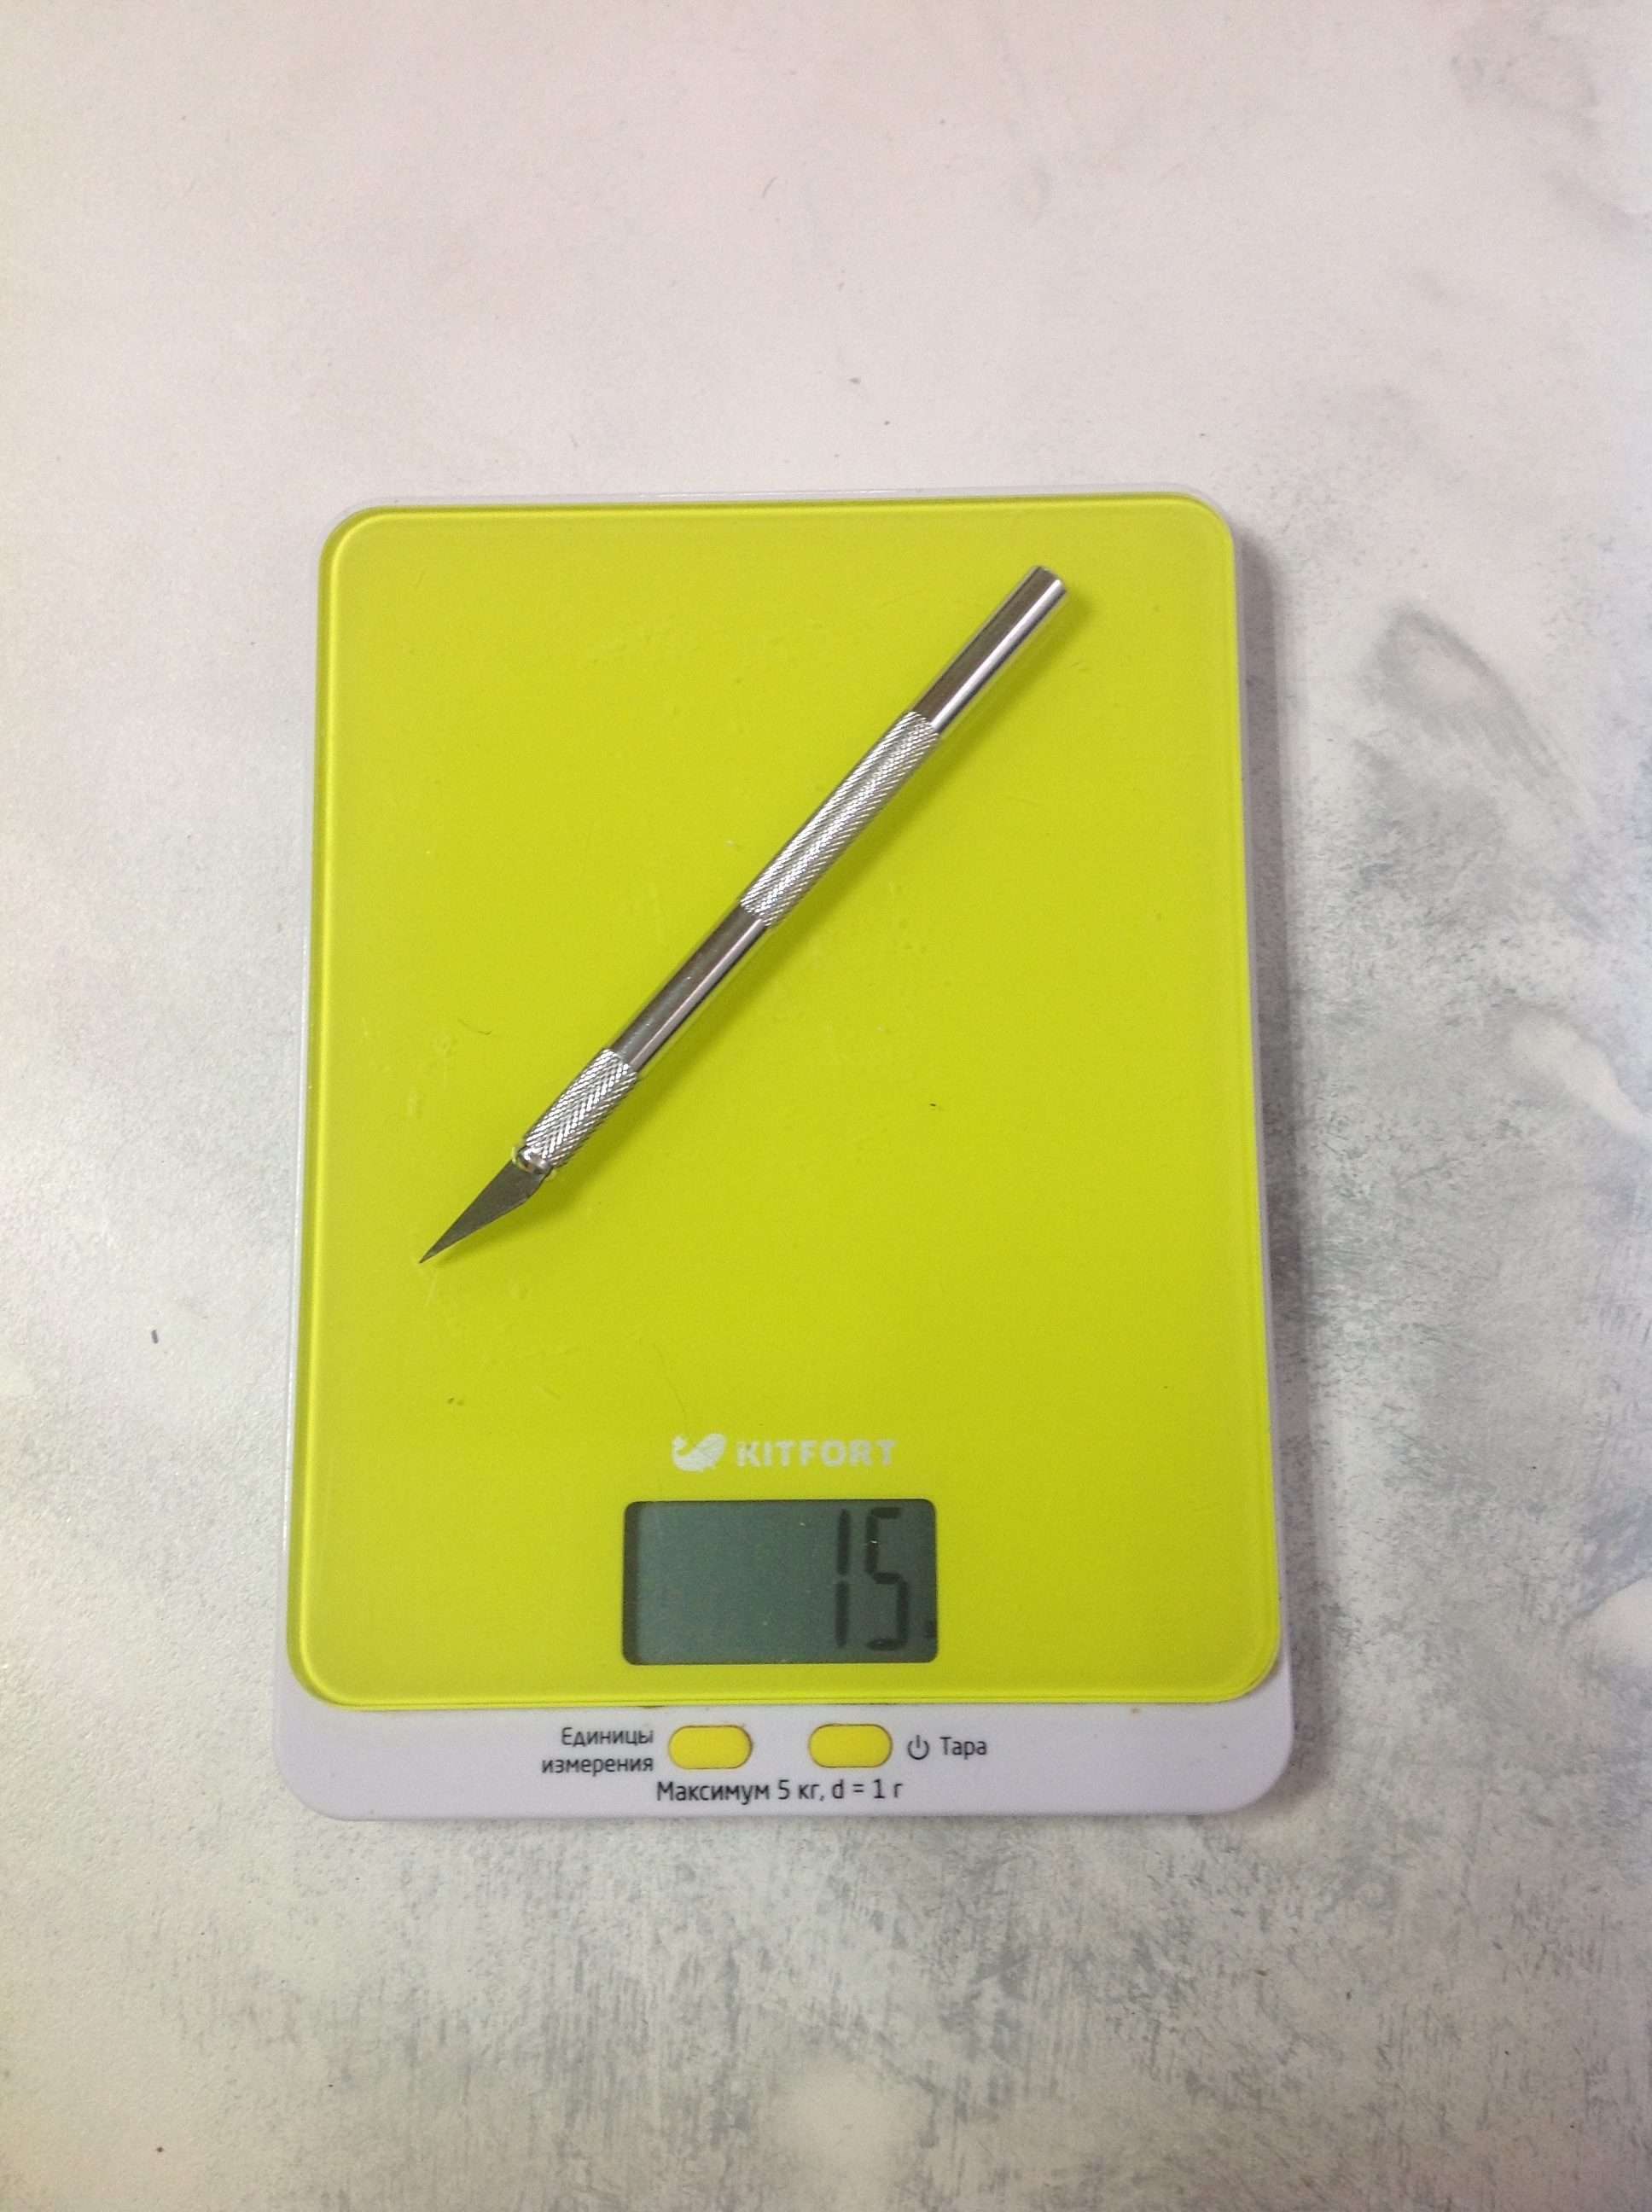 вес макетного ножа